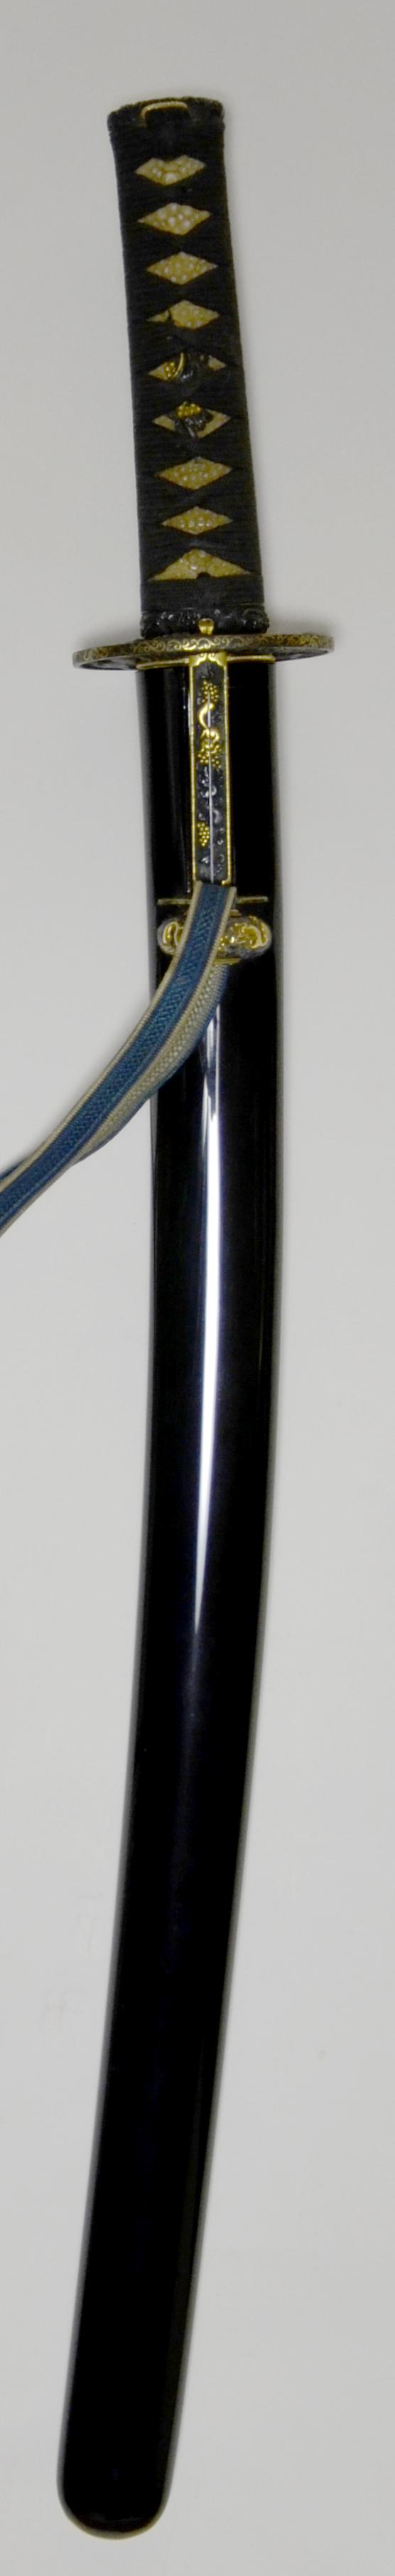 k21-7sukehiro